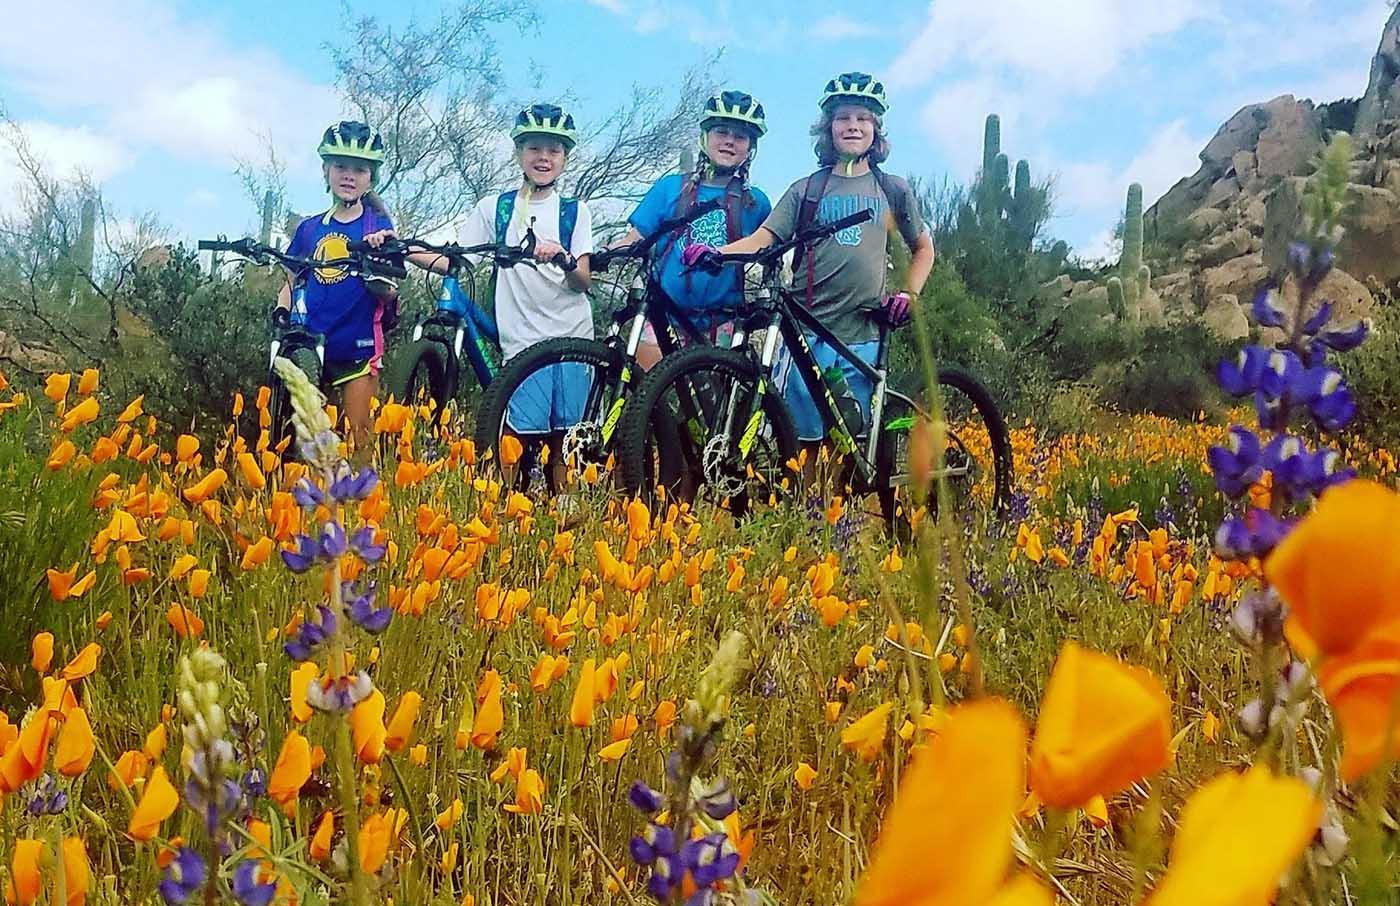 Mtn Biking Tour for Kids in Phoenix AZ